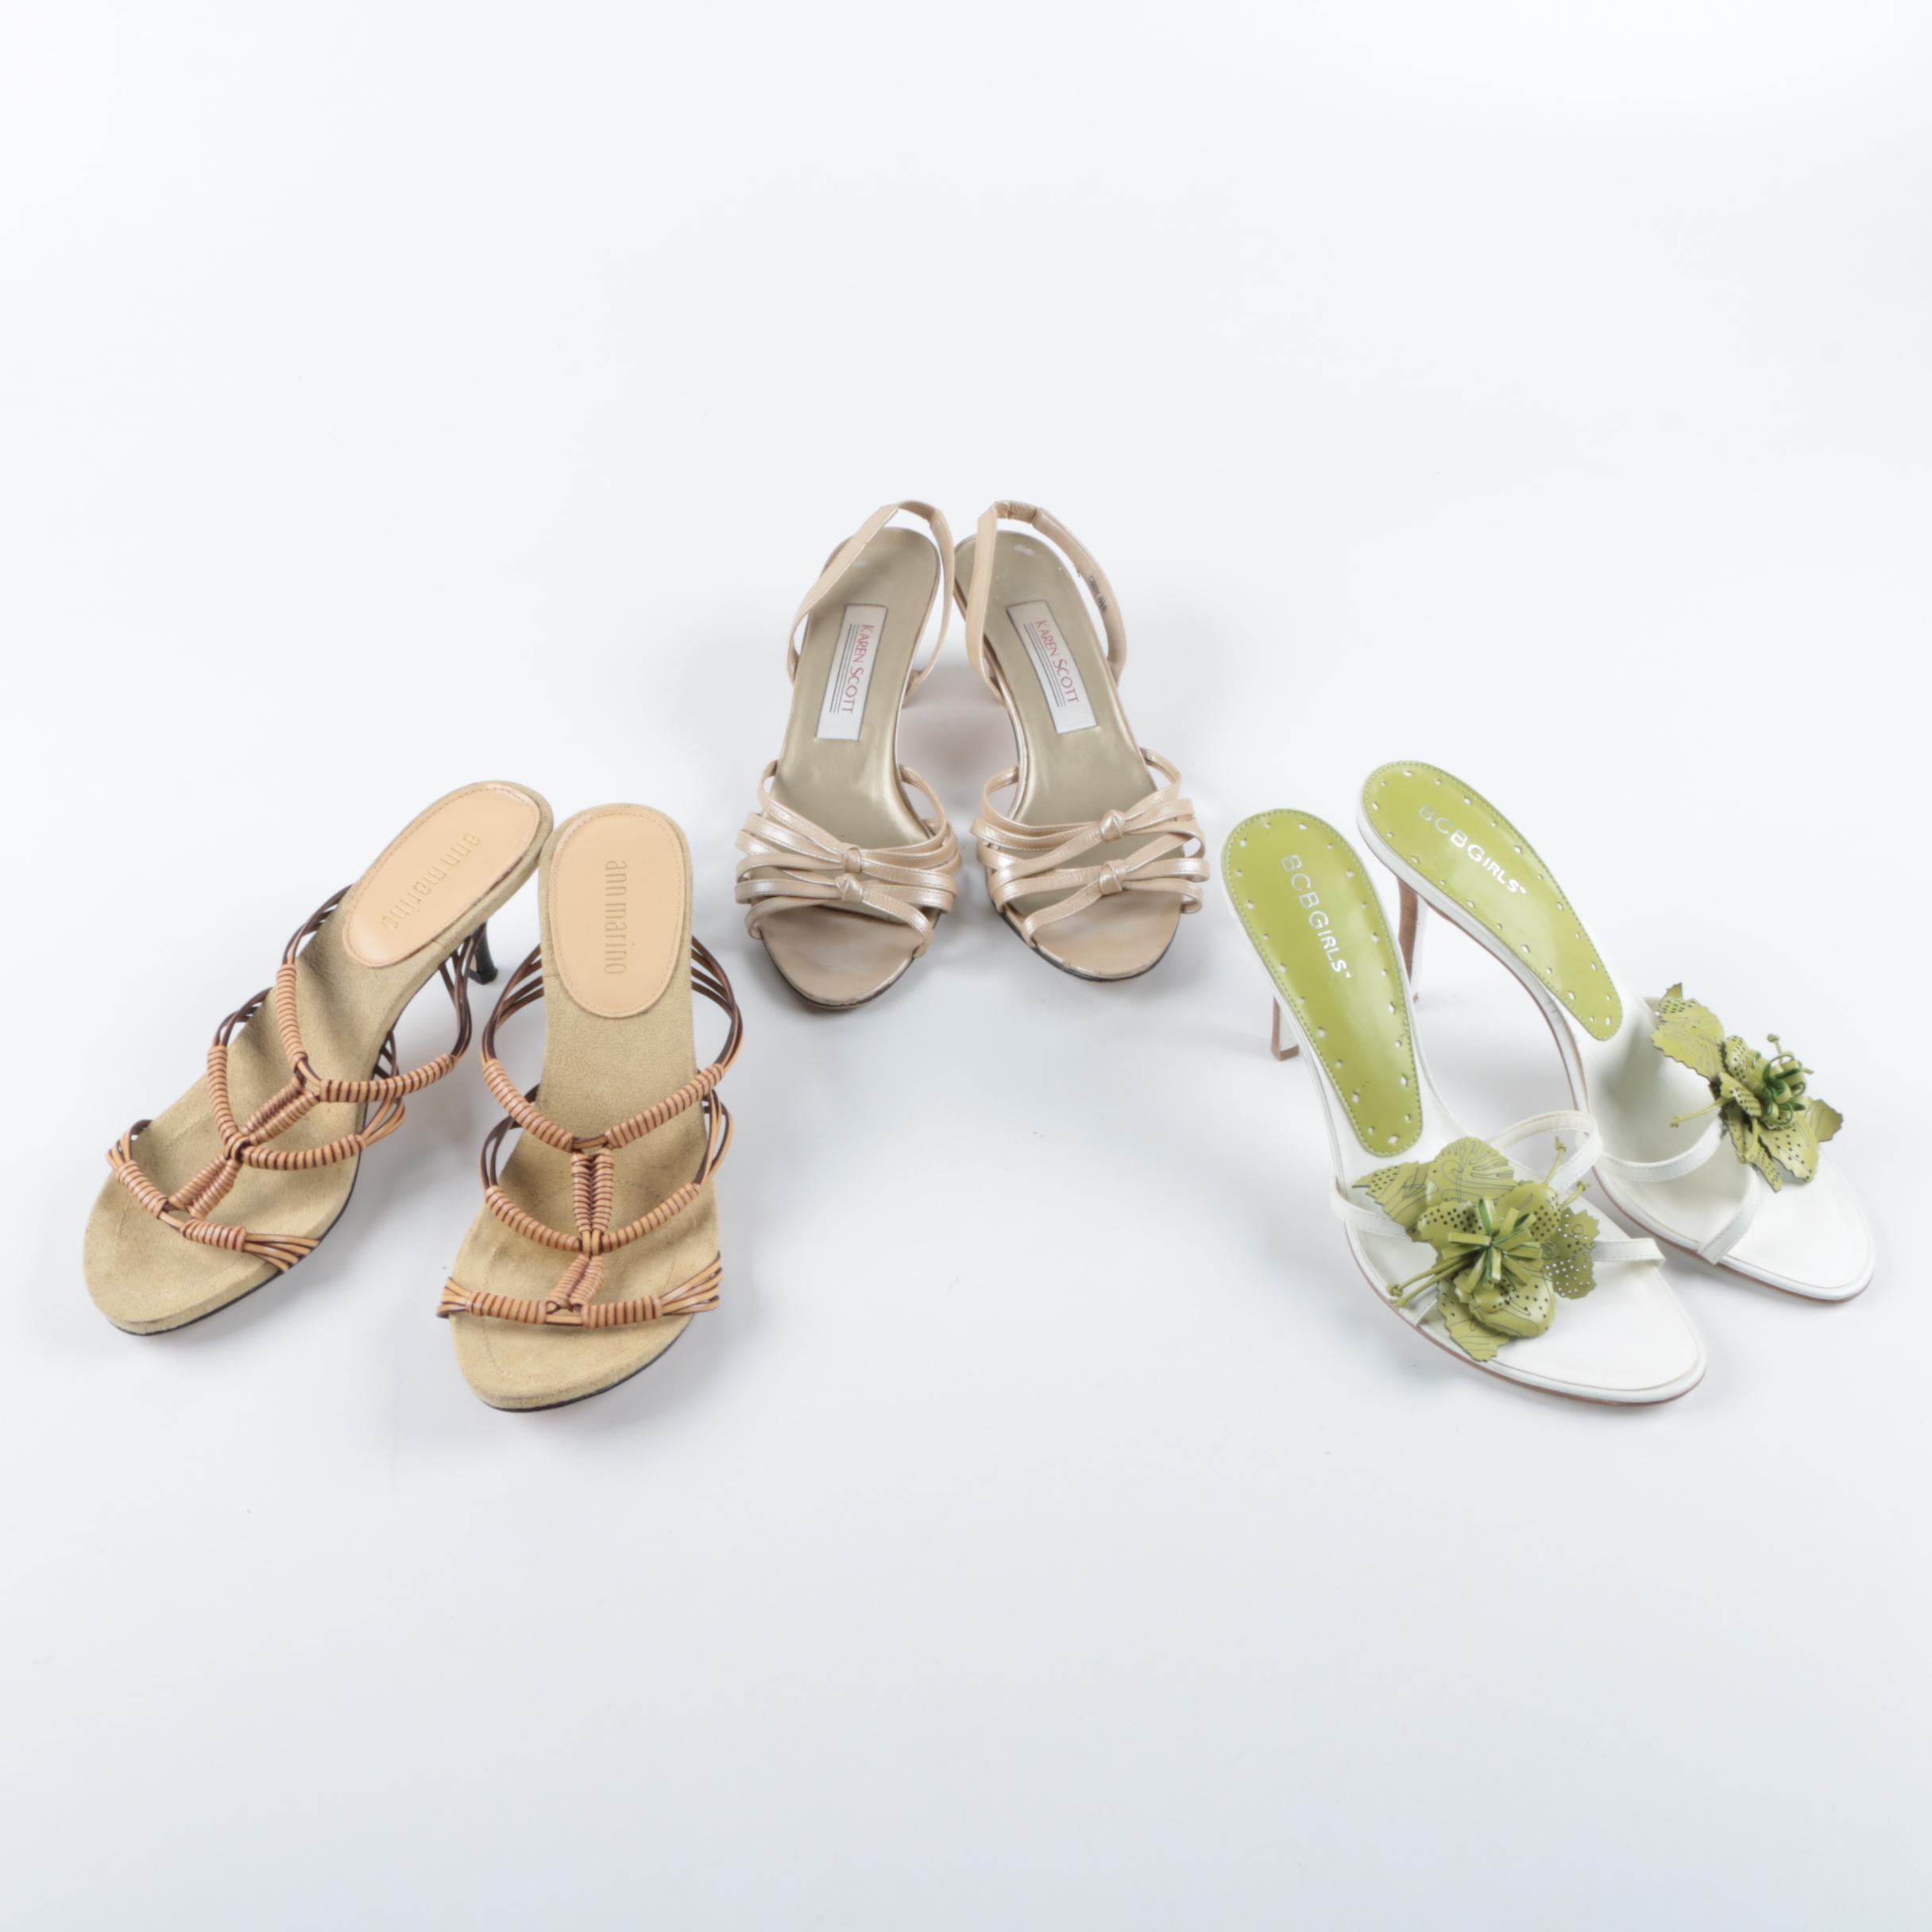 Women's High Heeled Shoes, Including BCBGirls